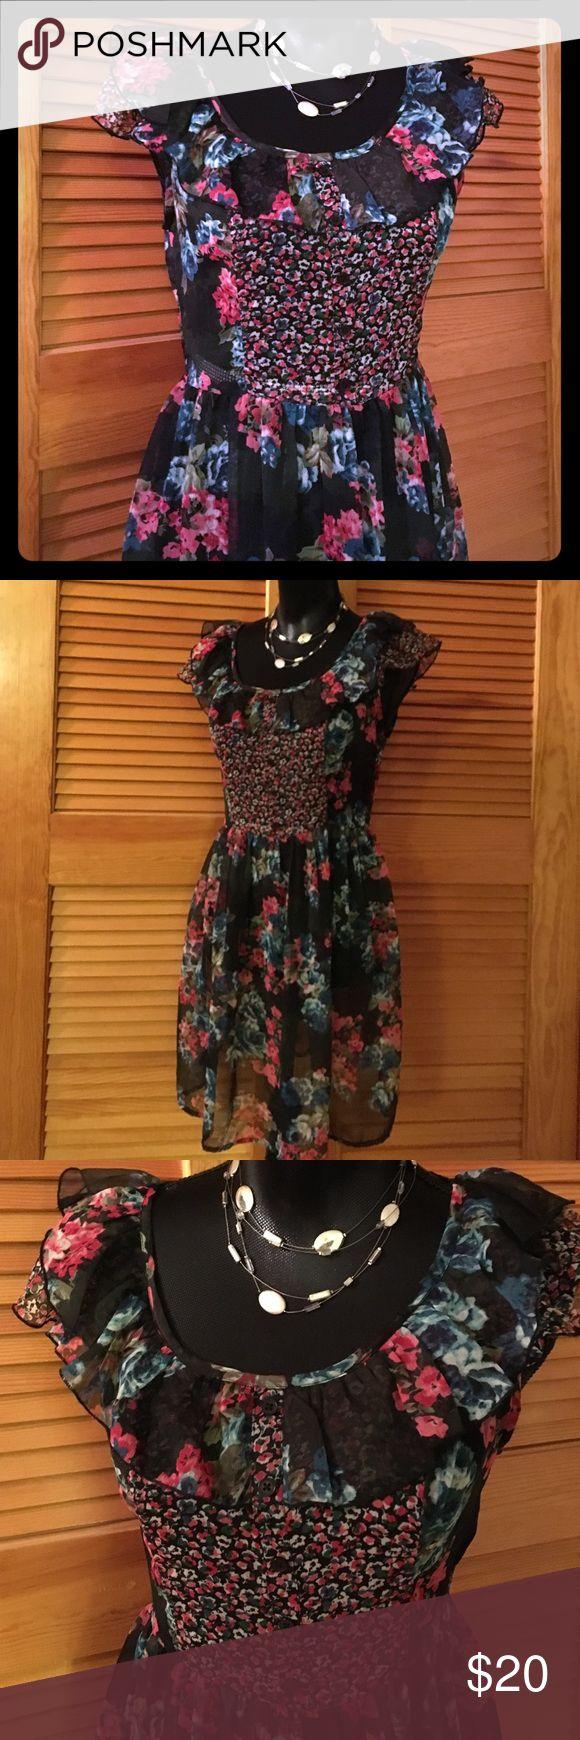 NWT American Rag Boho Dress Sz M Please feel free to ask questions... American Rag Dresses Mini